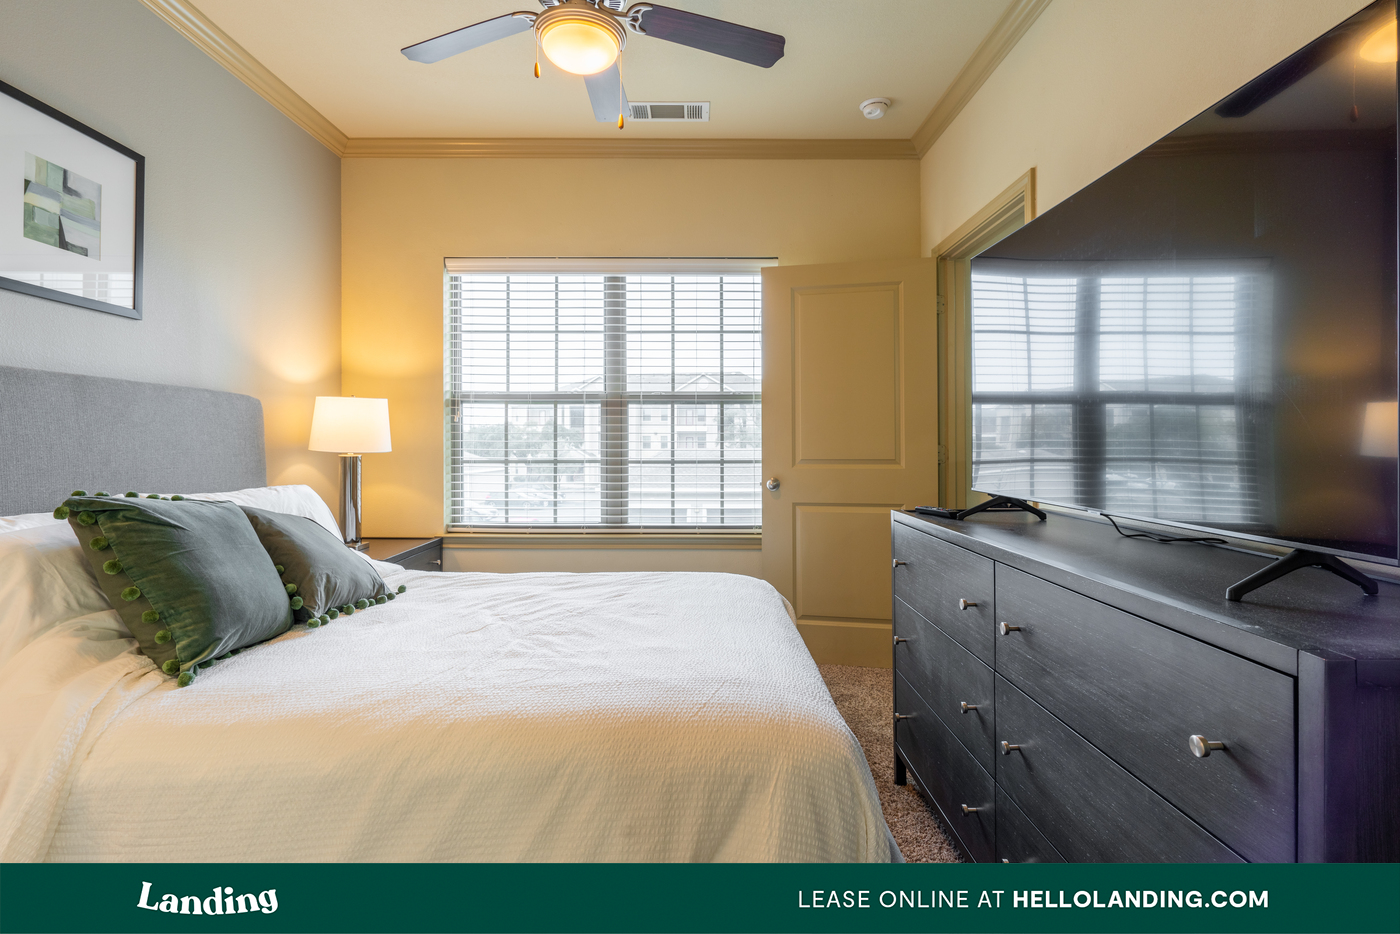 Pecan Springs 12-12205 for rent